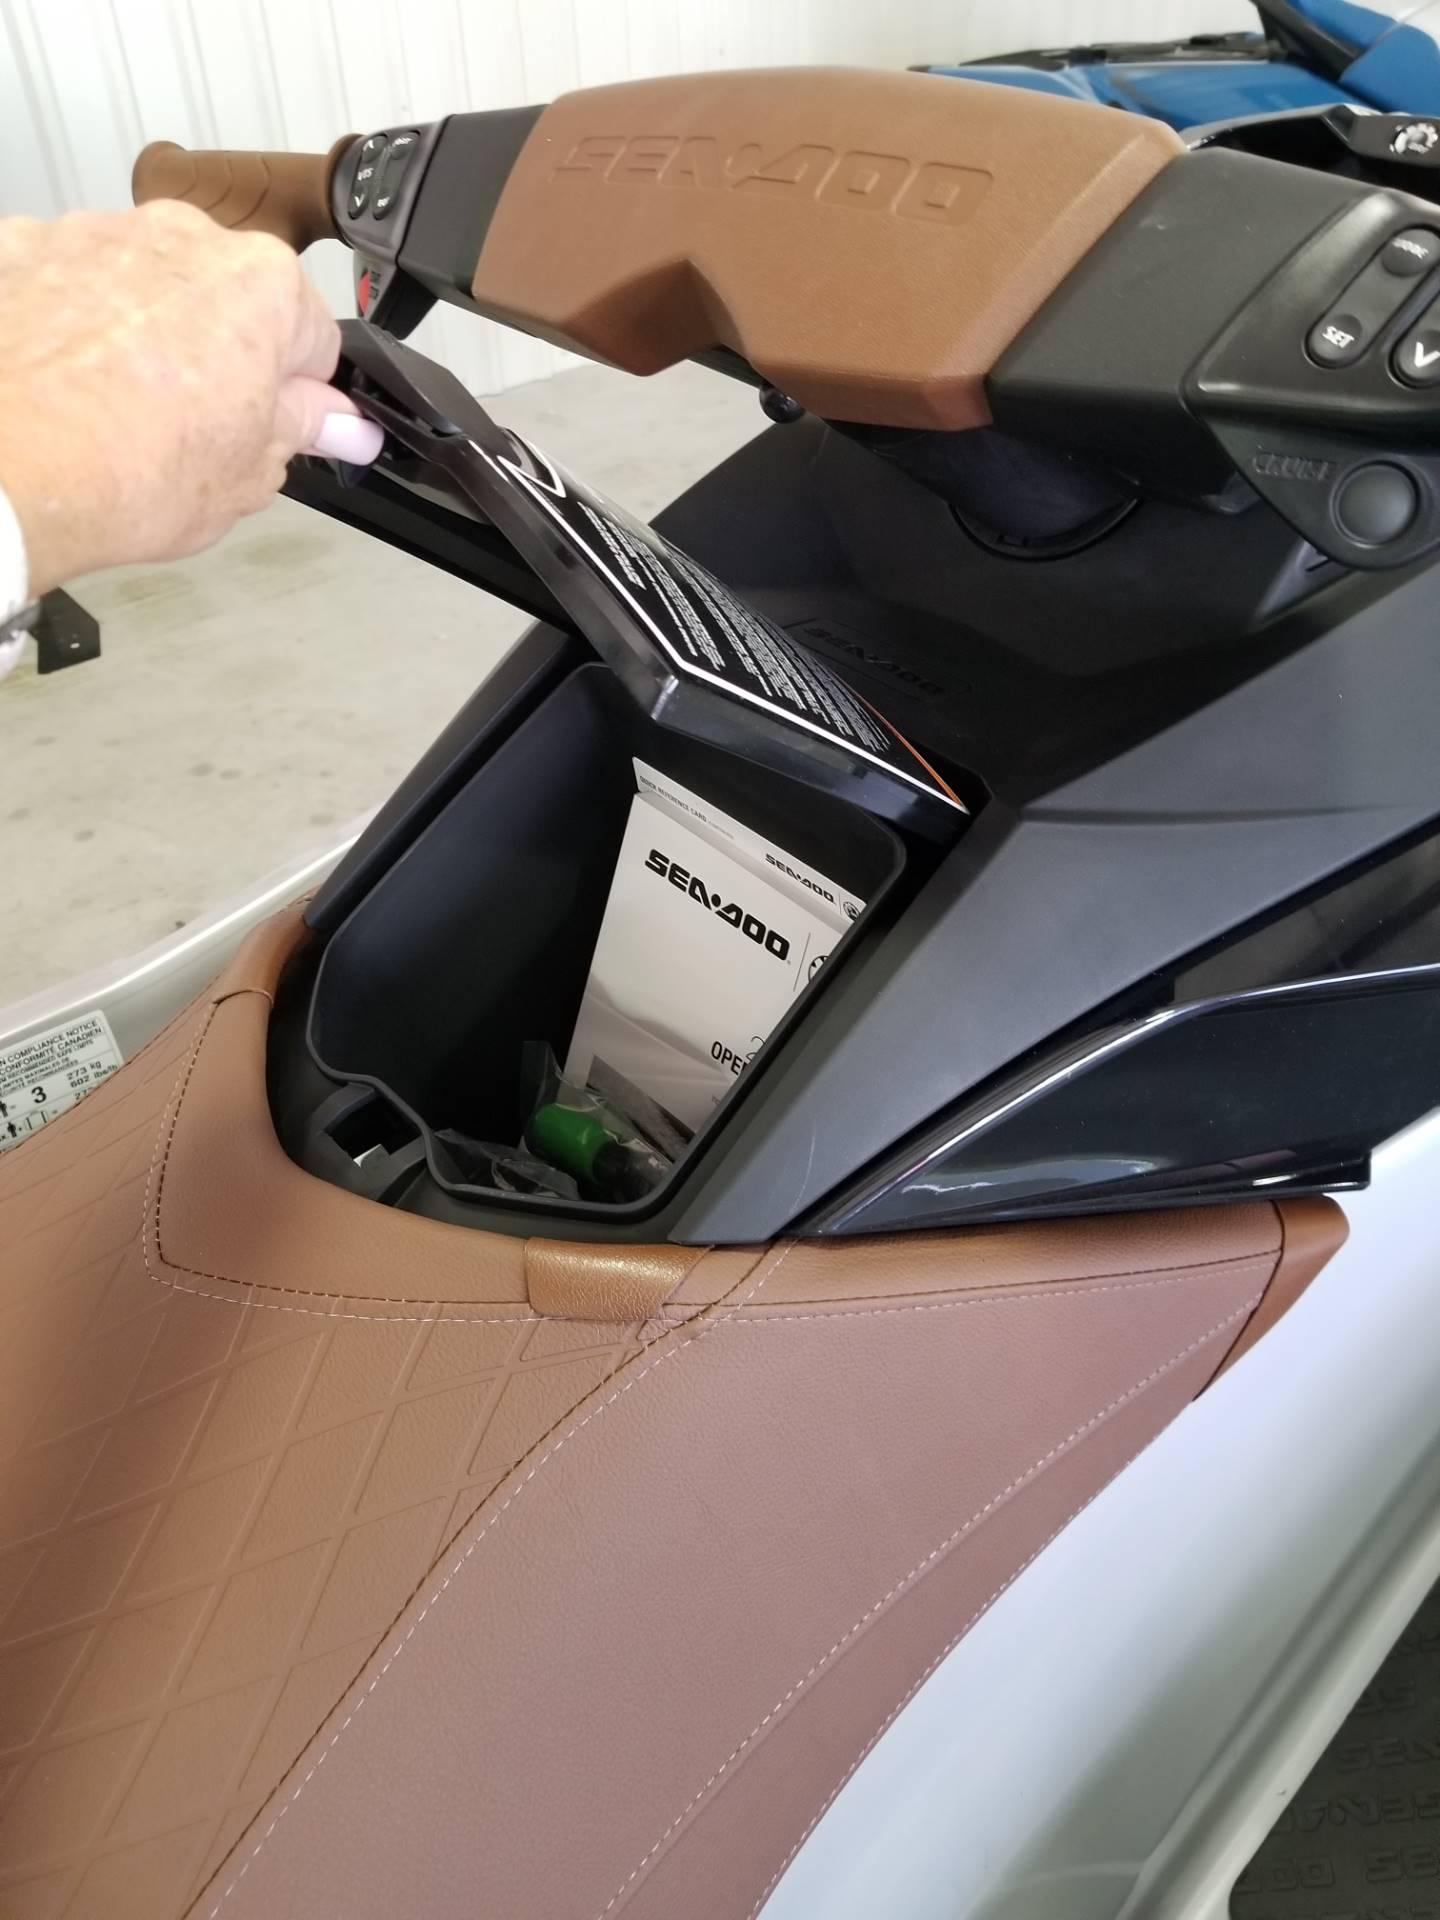 2018 Sea-Doo GTI Limited 155 8